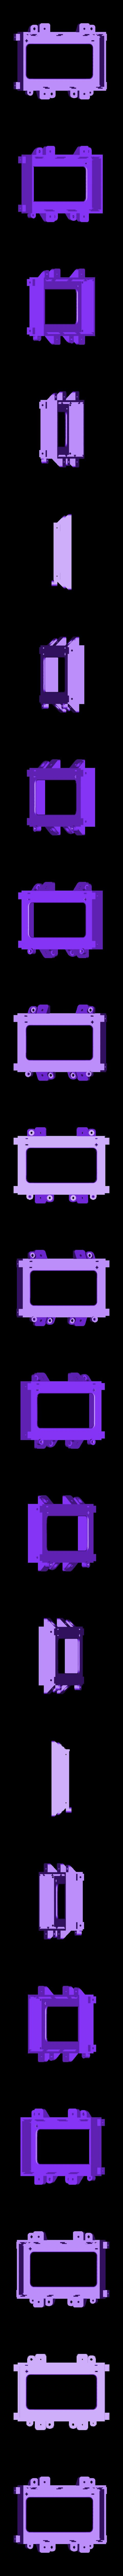 BatteryCase_3.stl Download free STL file Simula 5 Robot Developers Kit • 3D printable model, JamieLaing